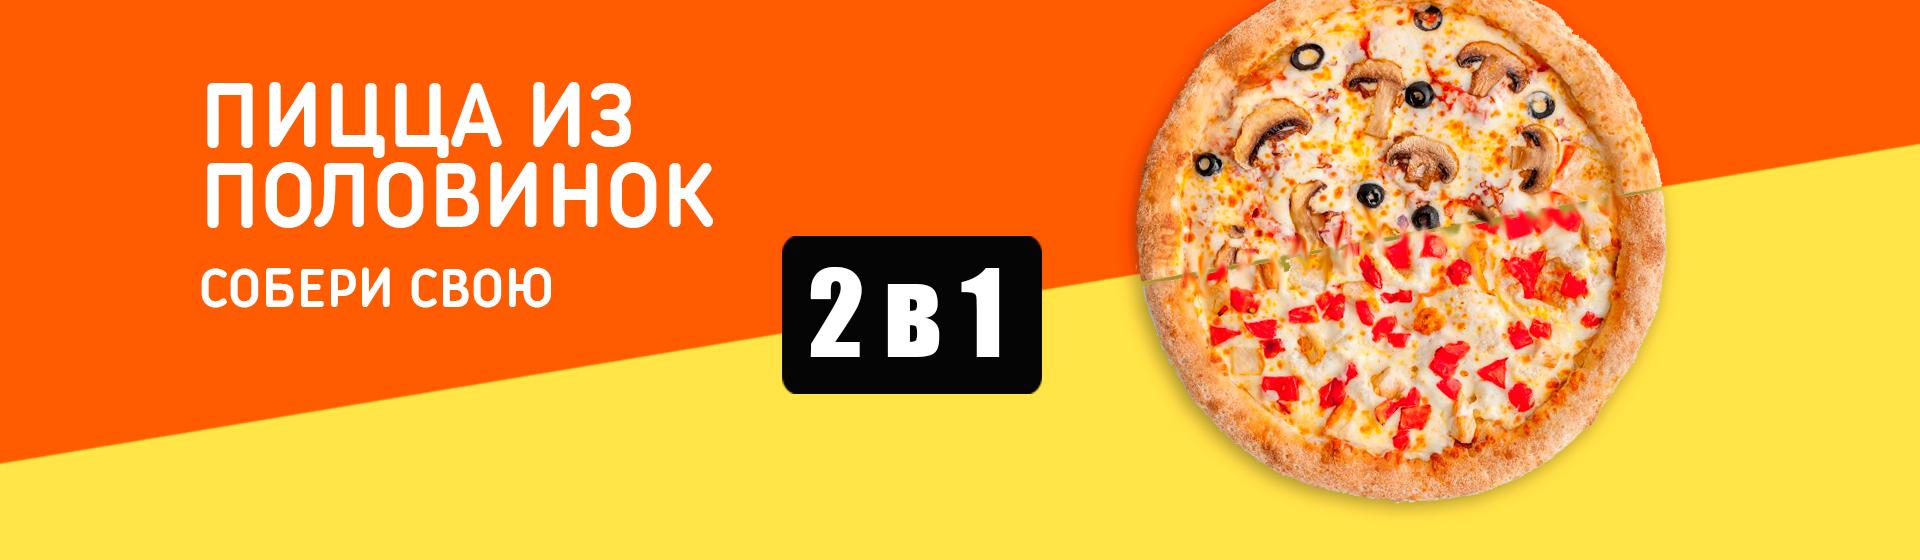 Пицца из половинок - Собери свою!